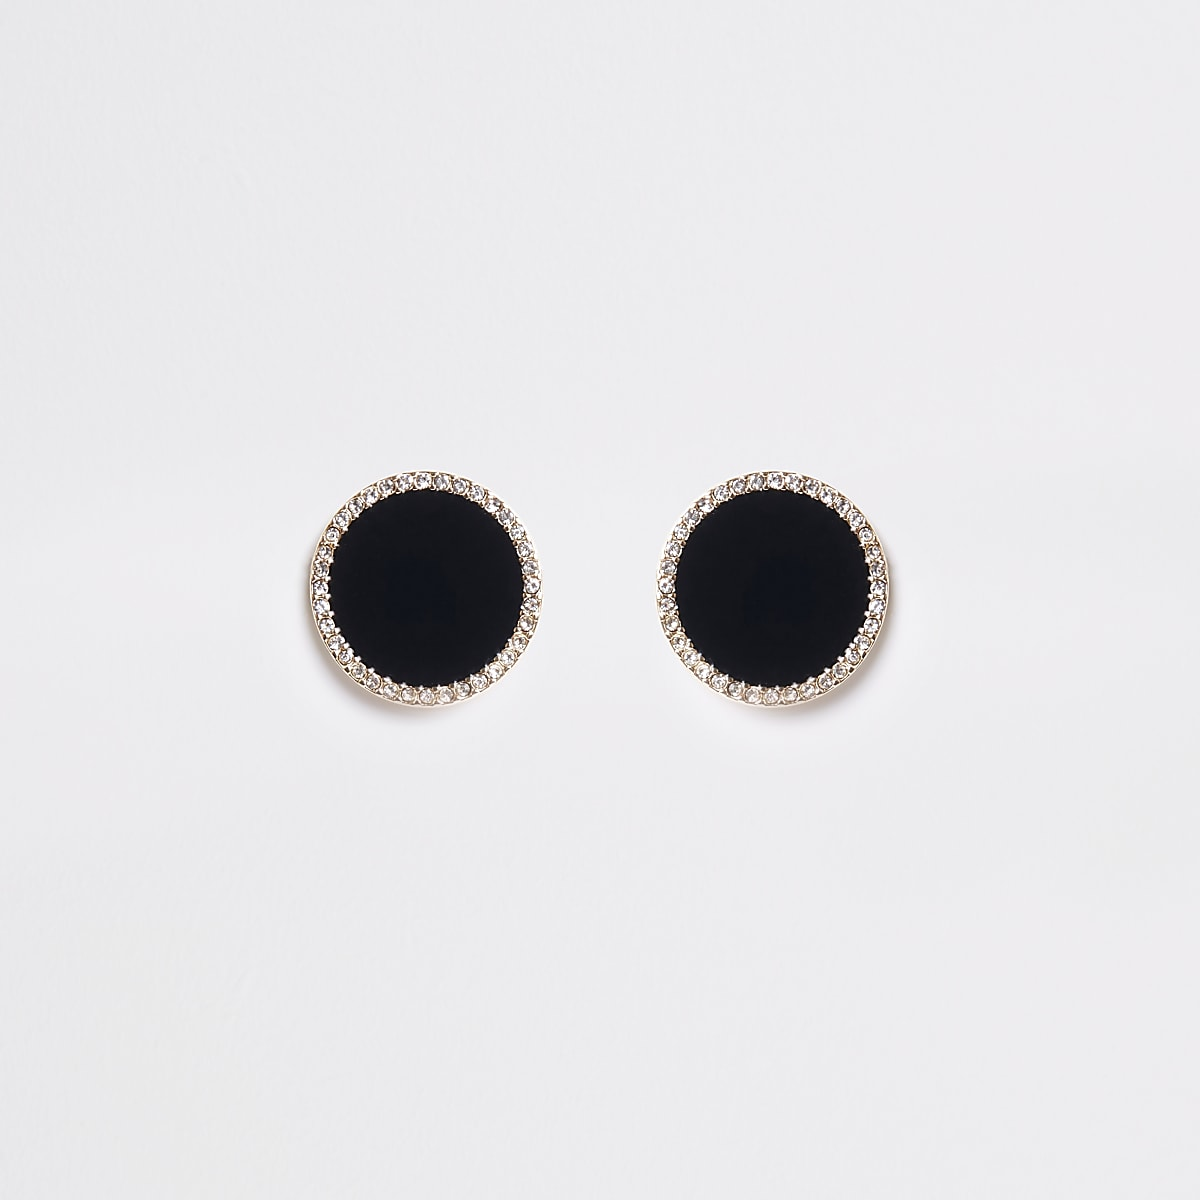 Schwarze, große Ohrringe